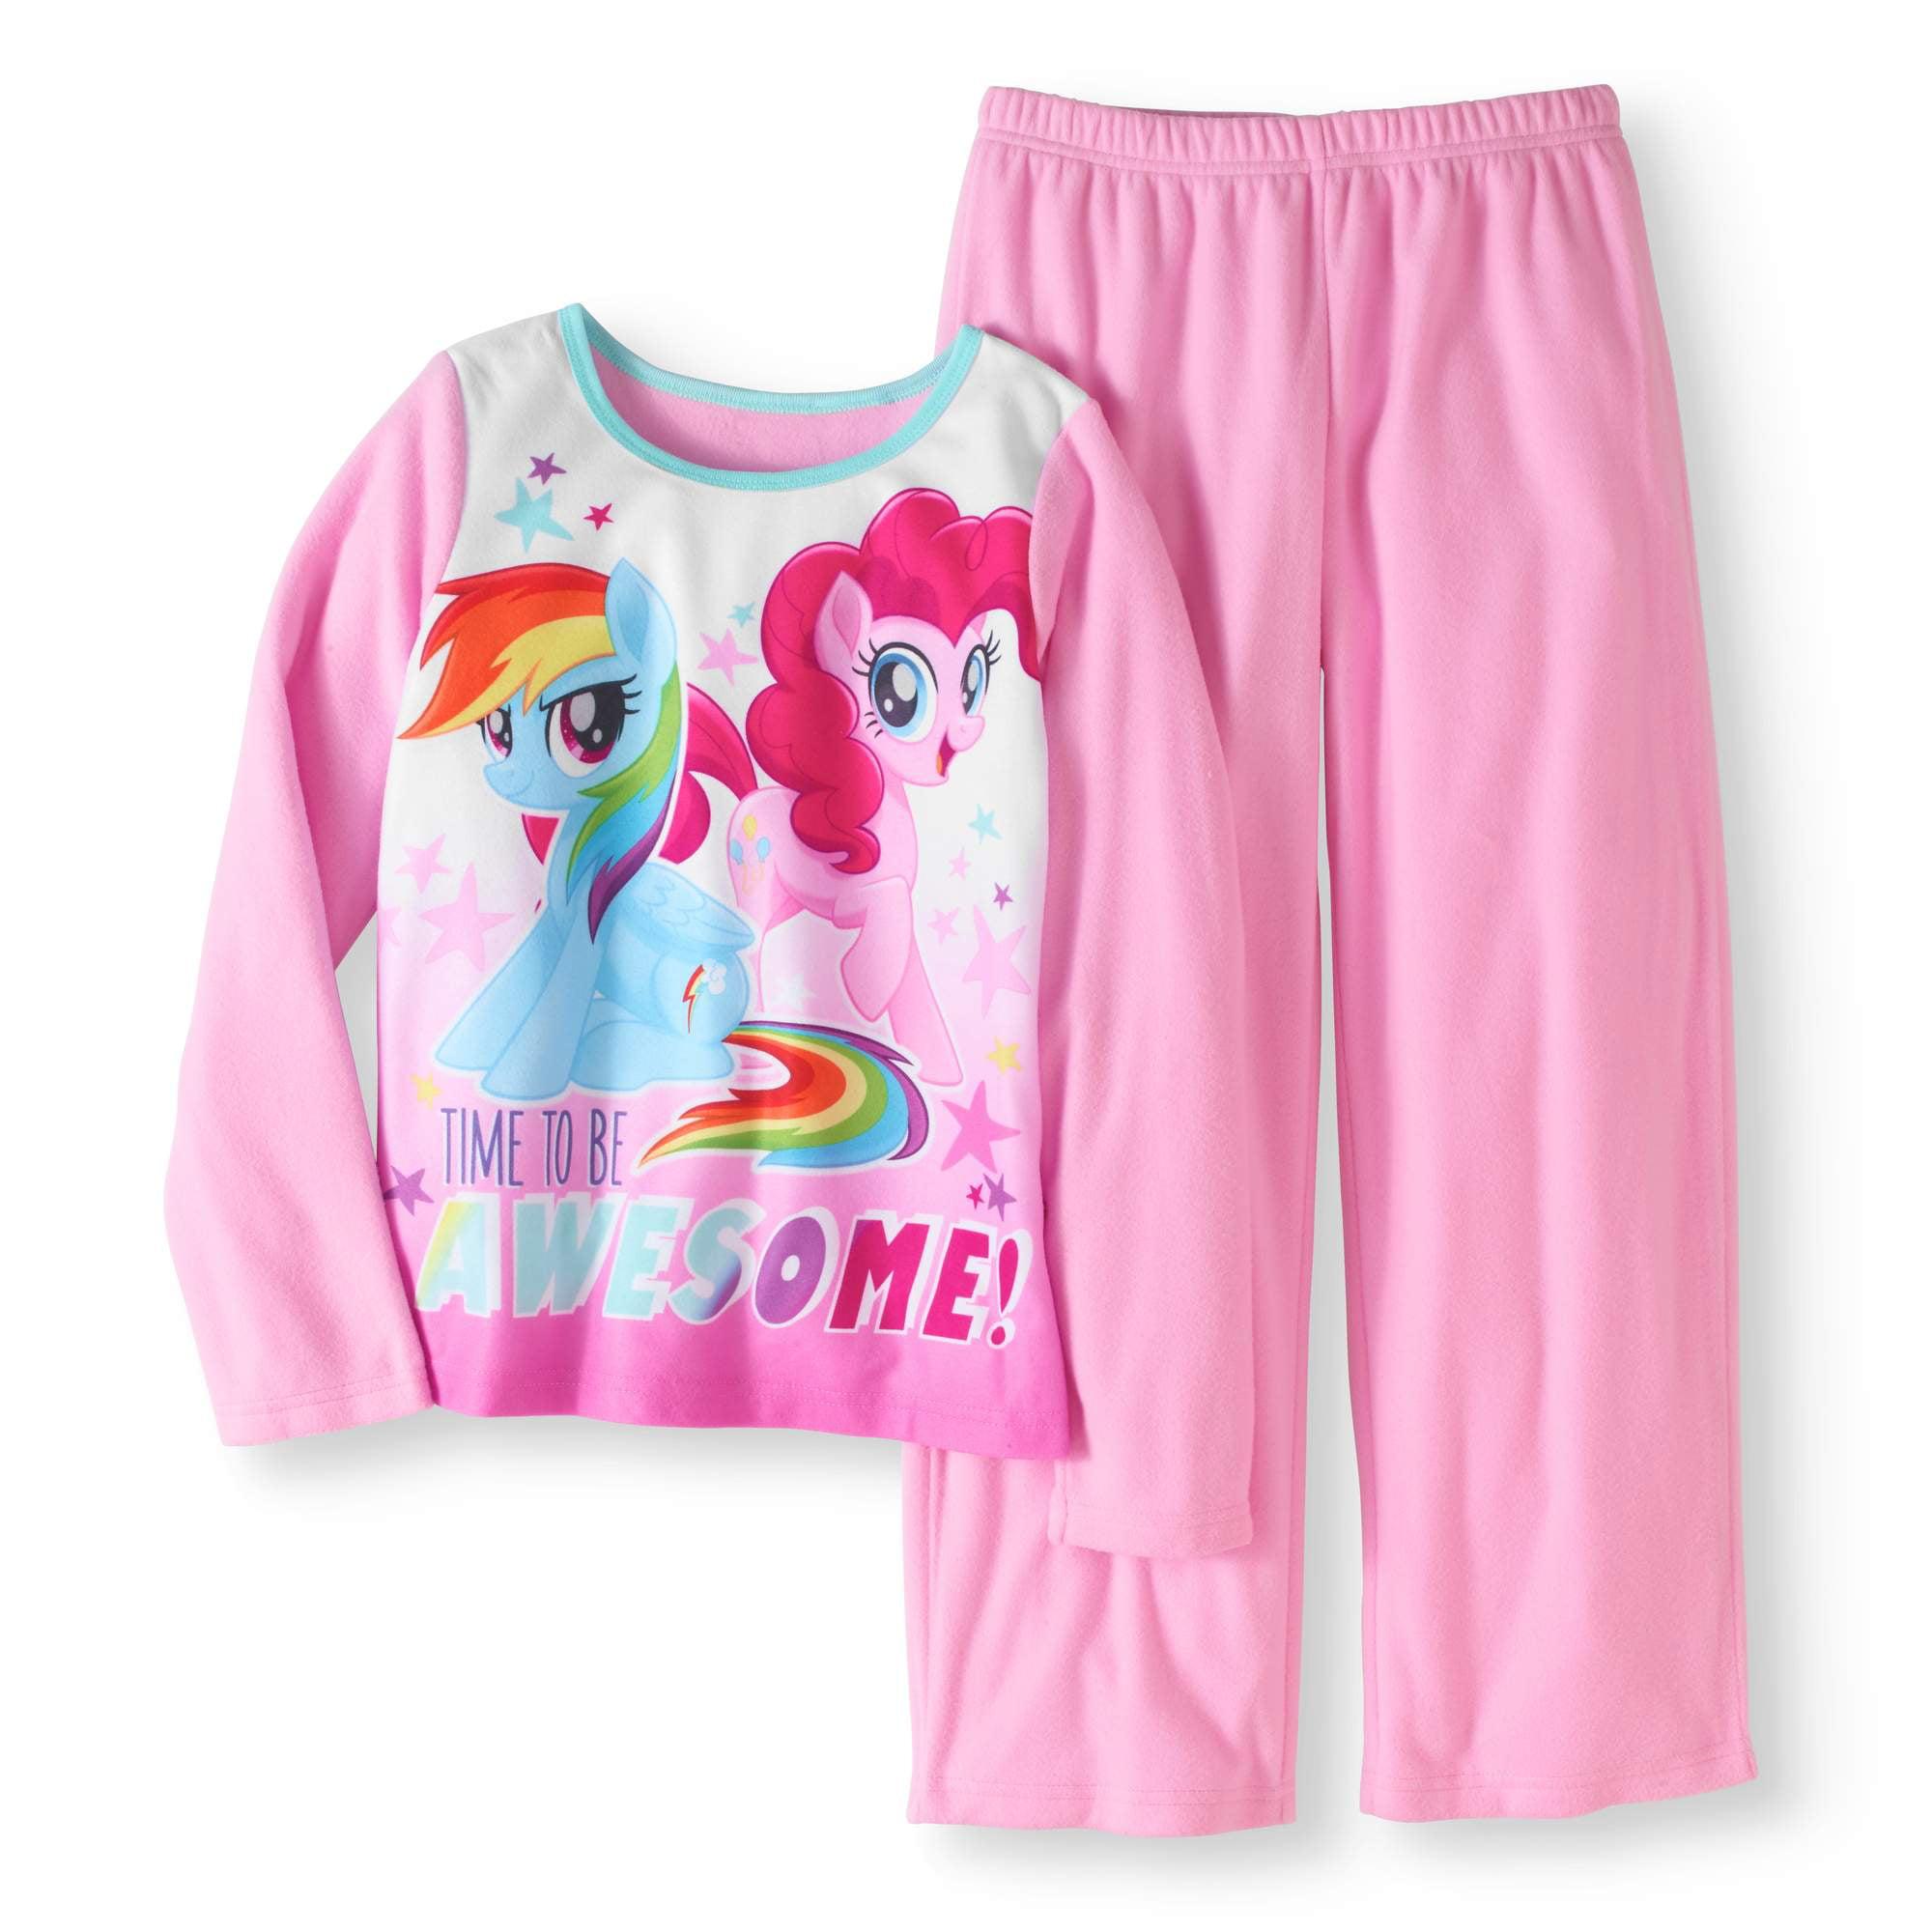 76a2ecad2110 Girls  2 Piece Pajama Set – Walmart Inventory Checker – BrickSeek